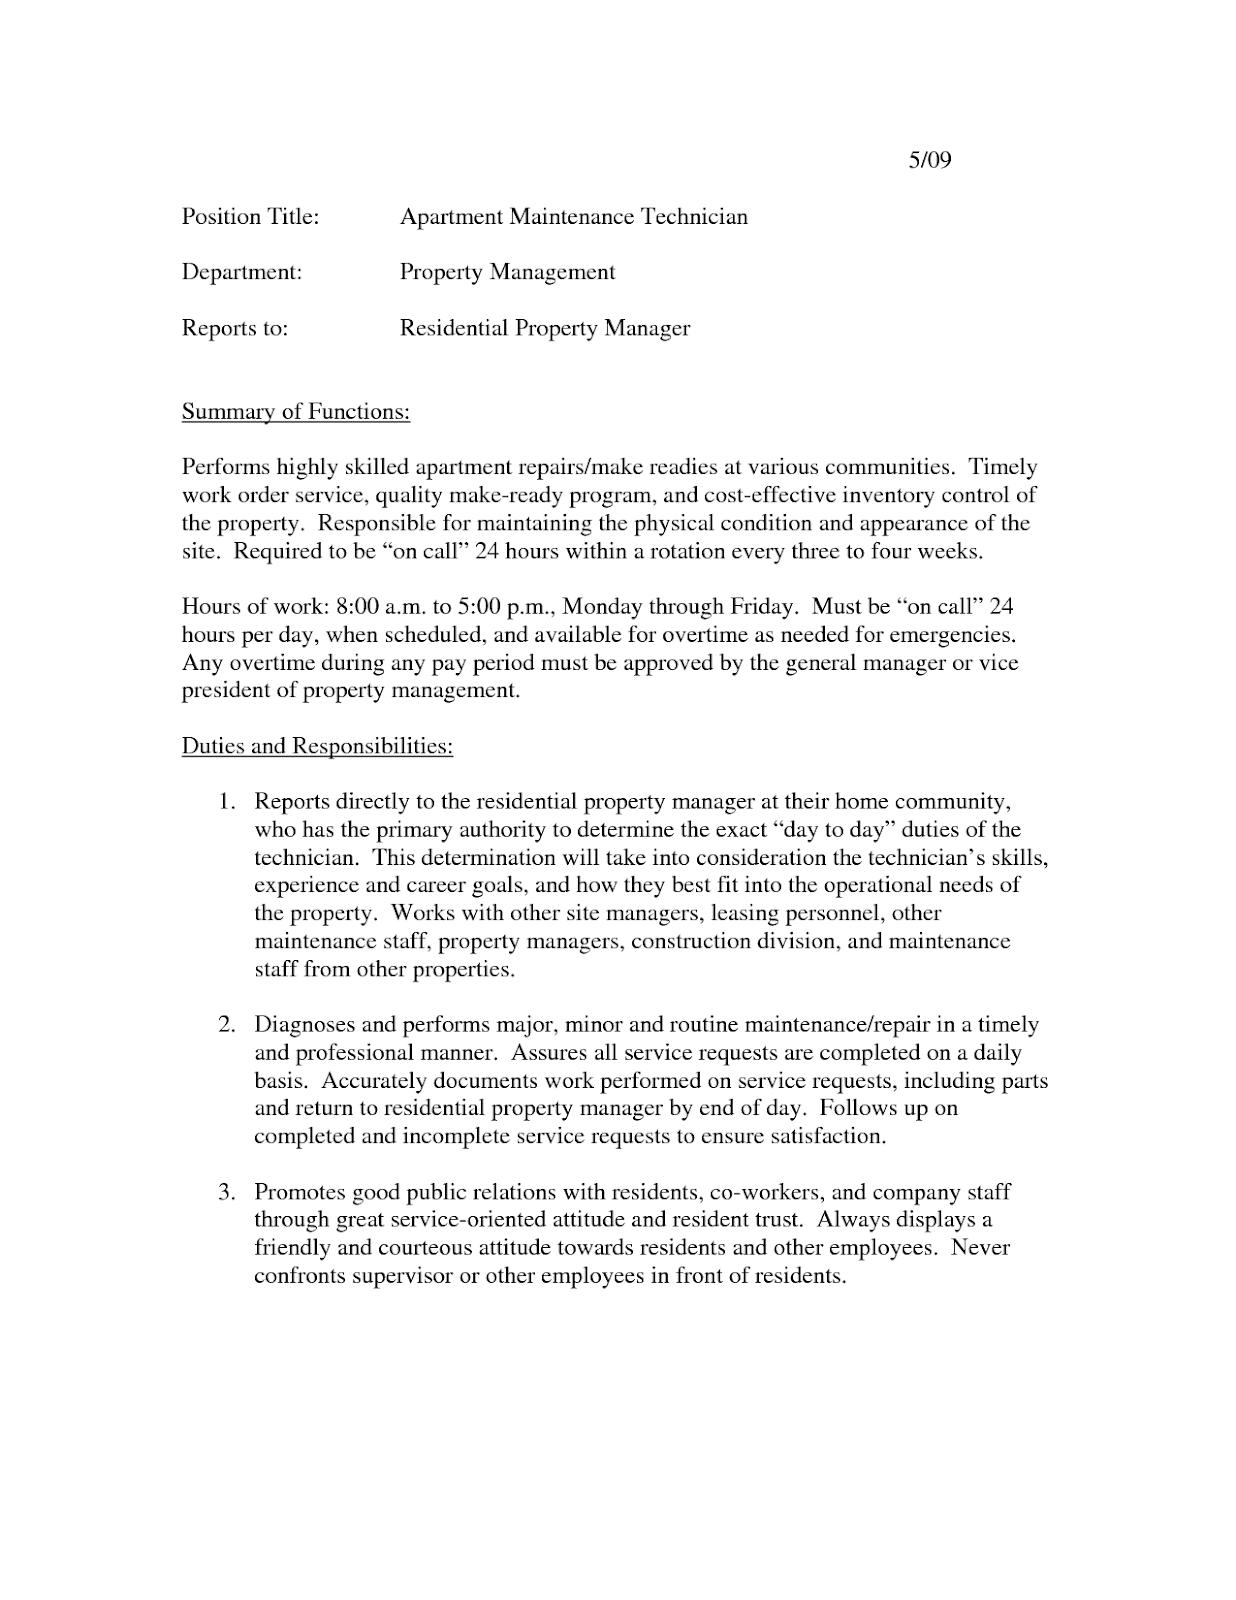 Apartment Maintenance Technician Resume